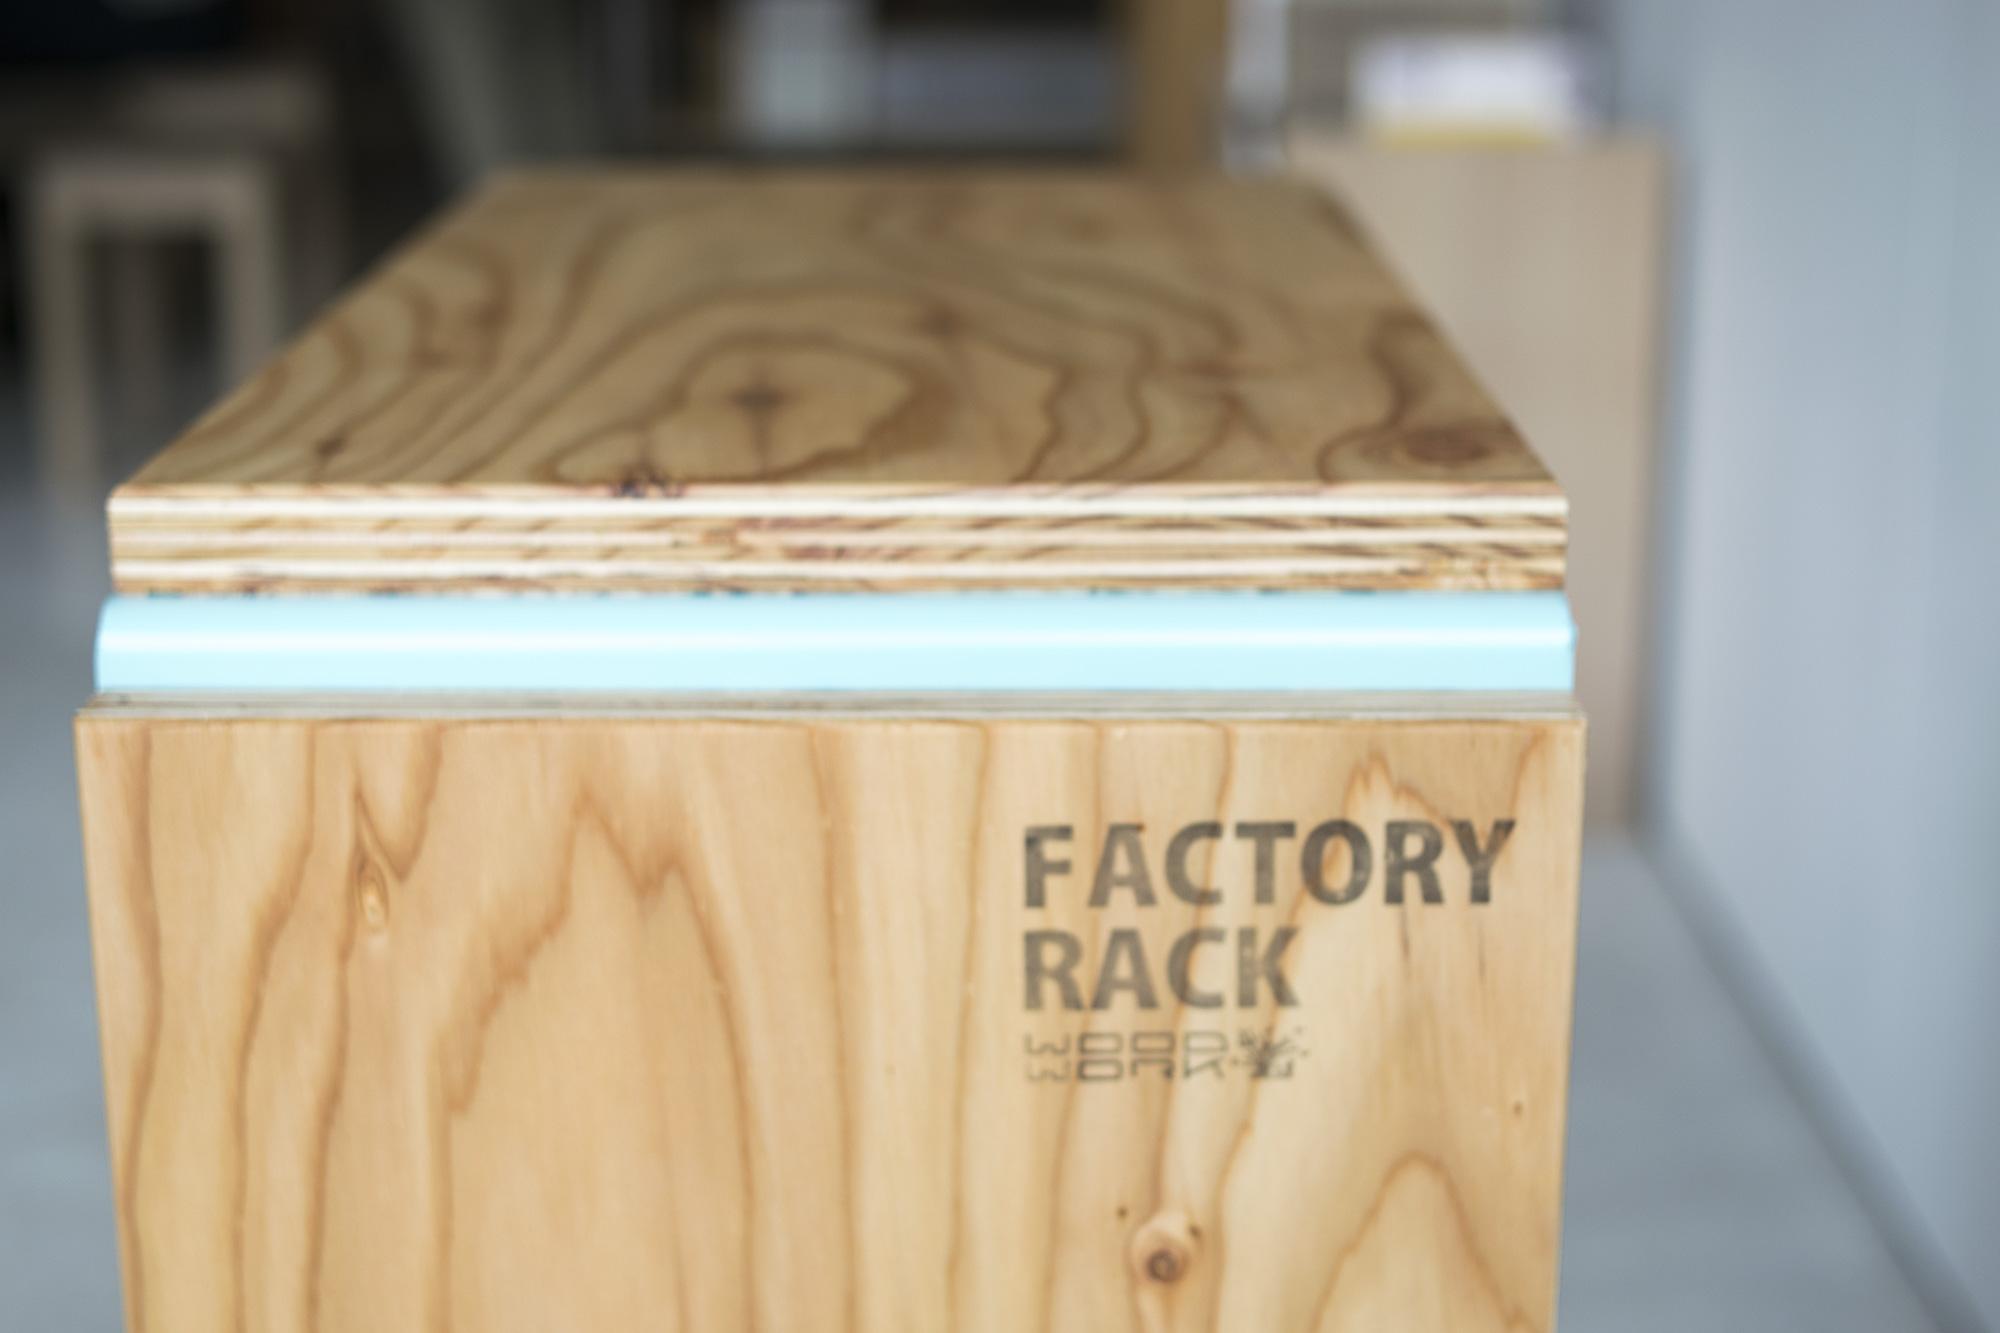 Factory Rack スタンプ